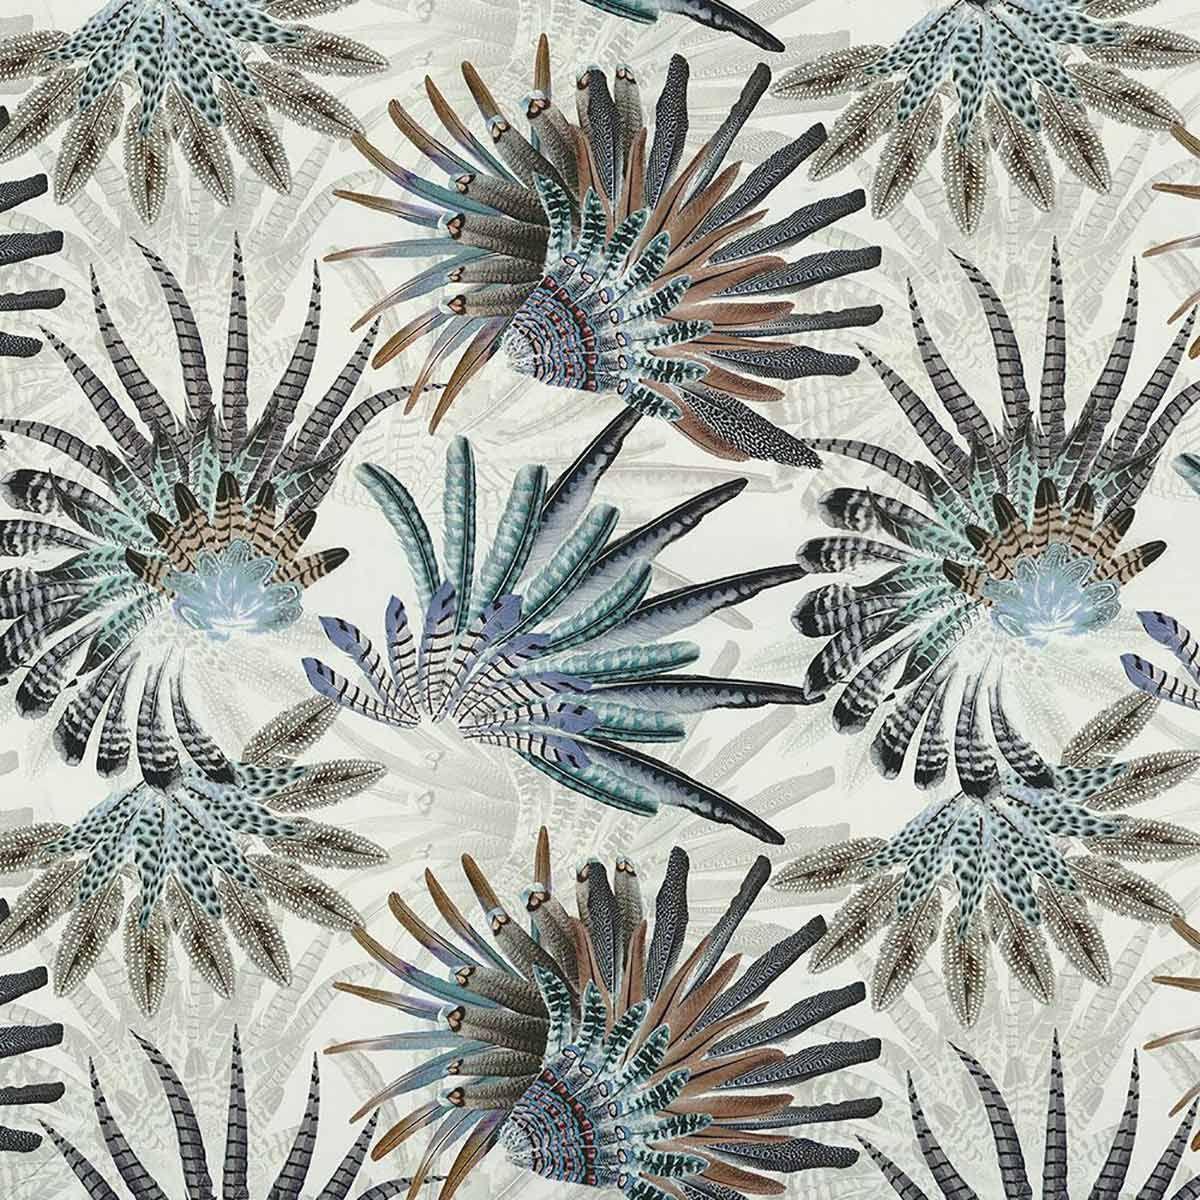 Tissu Touraco - Casamance | Stores et rideaux | Pinterest | Interiors